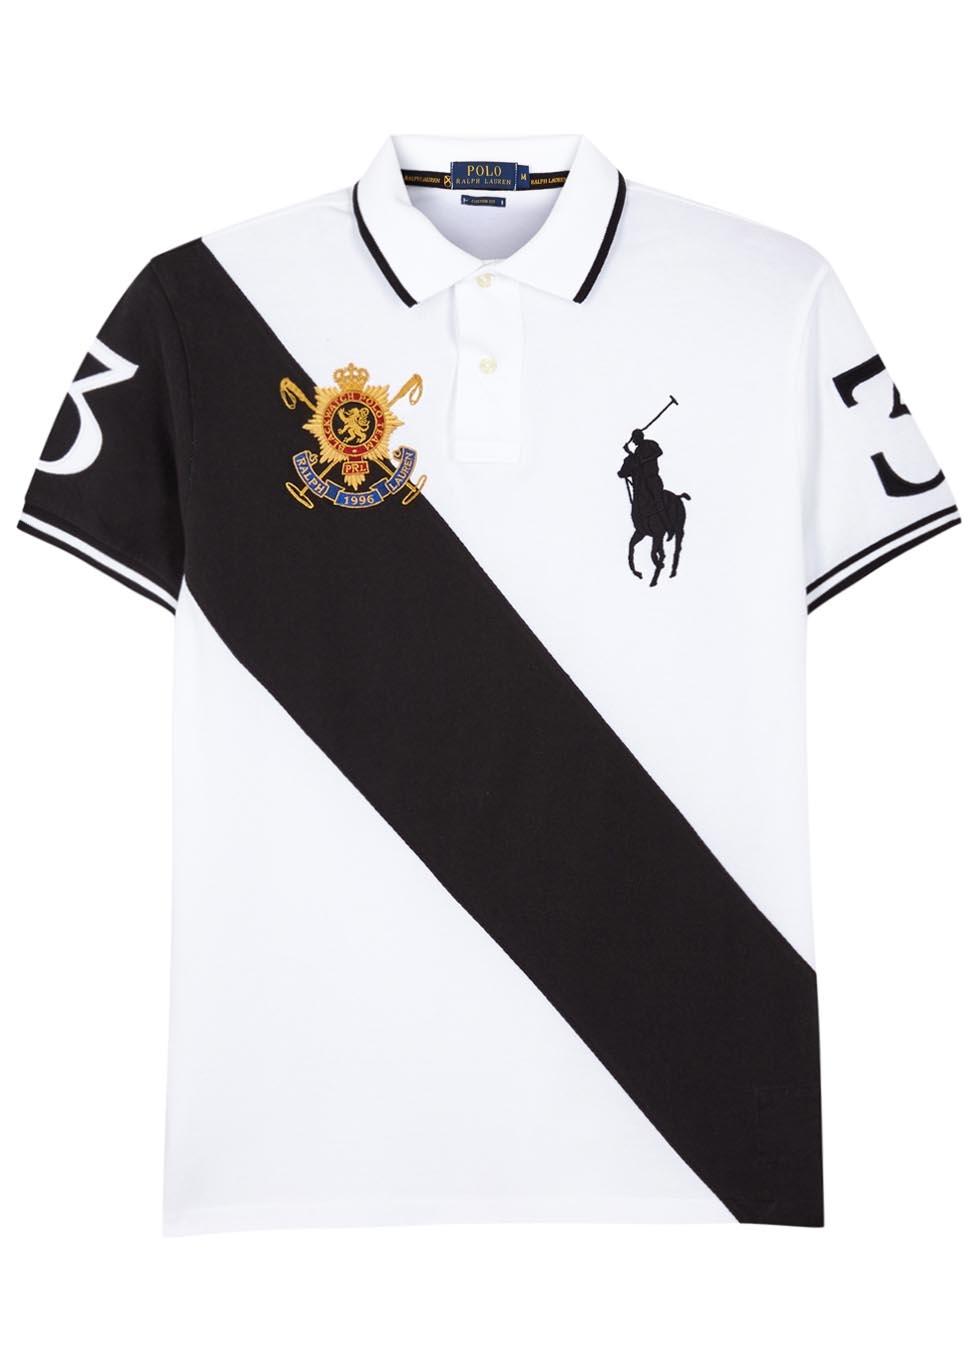 Polo ralph lauren black watch piqu cotton polo shirt for Black cotton polo shirt